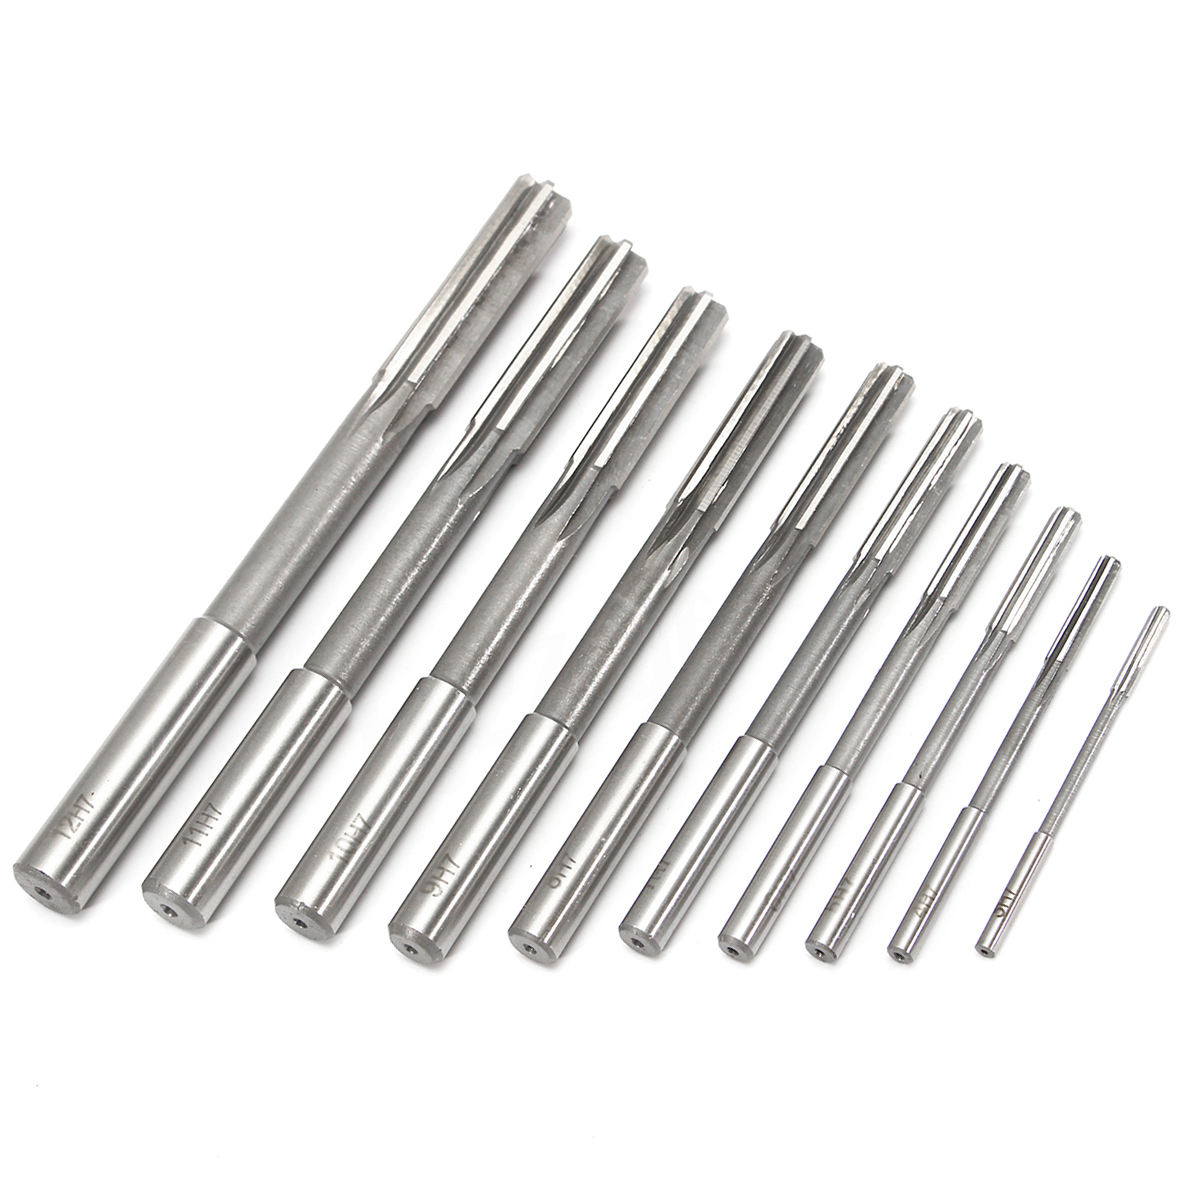 Aliexpress.com : Buy 10pcs HSS H7 Straight Shank Milling